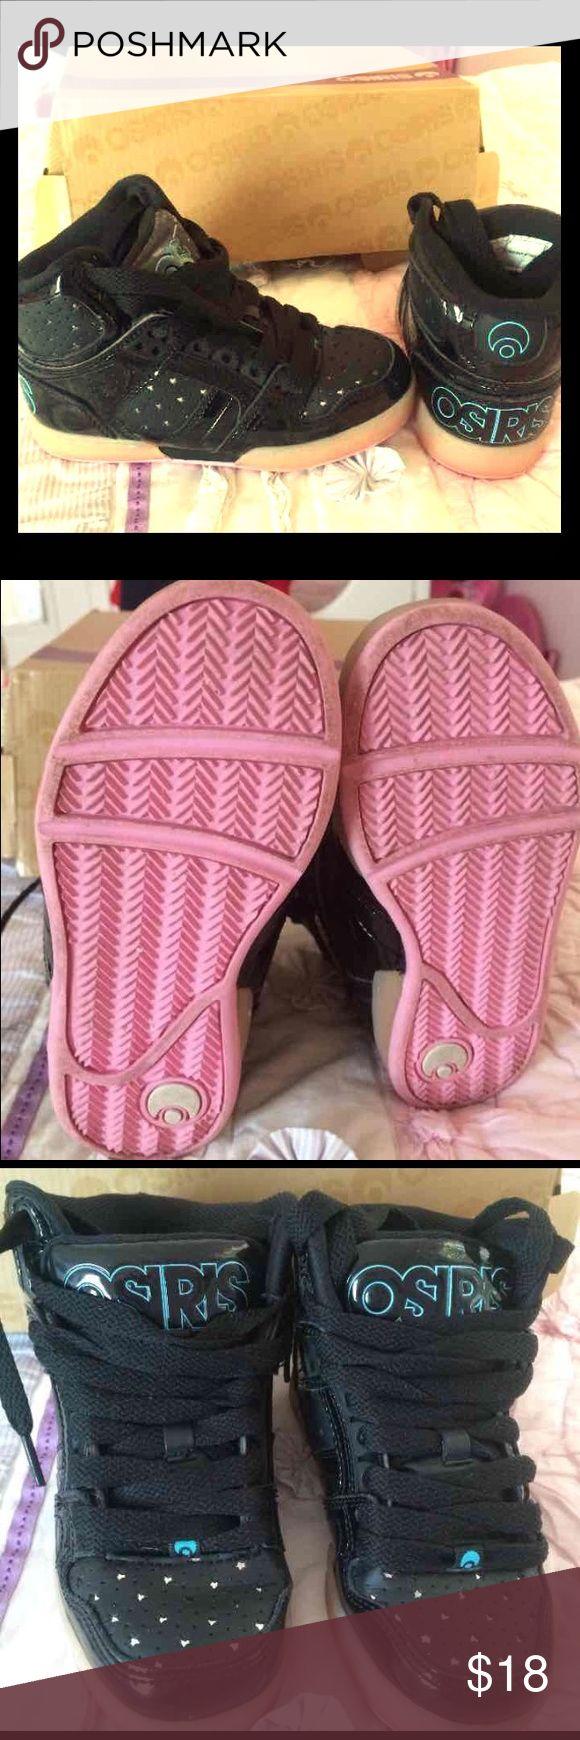 Like new size 12  Osiris star skater girls shoes. Like new size 12  Osiris star skater girls shoes. star details so adorable worn 1x Osiris Shoes Sneakers